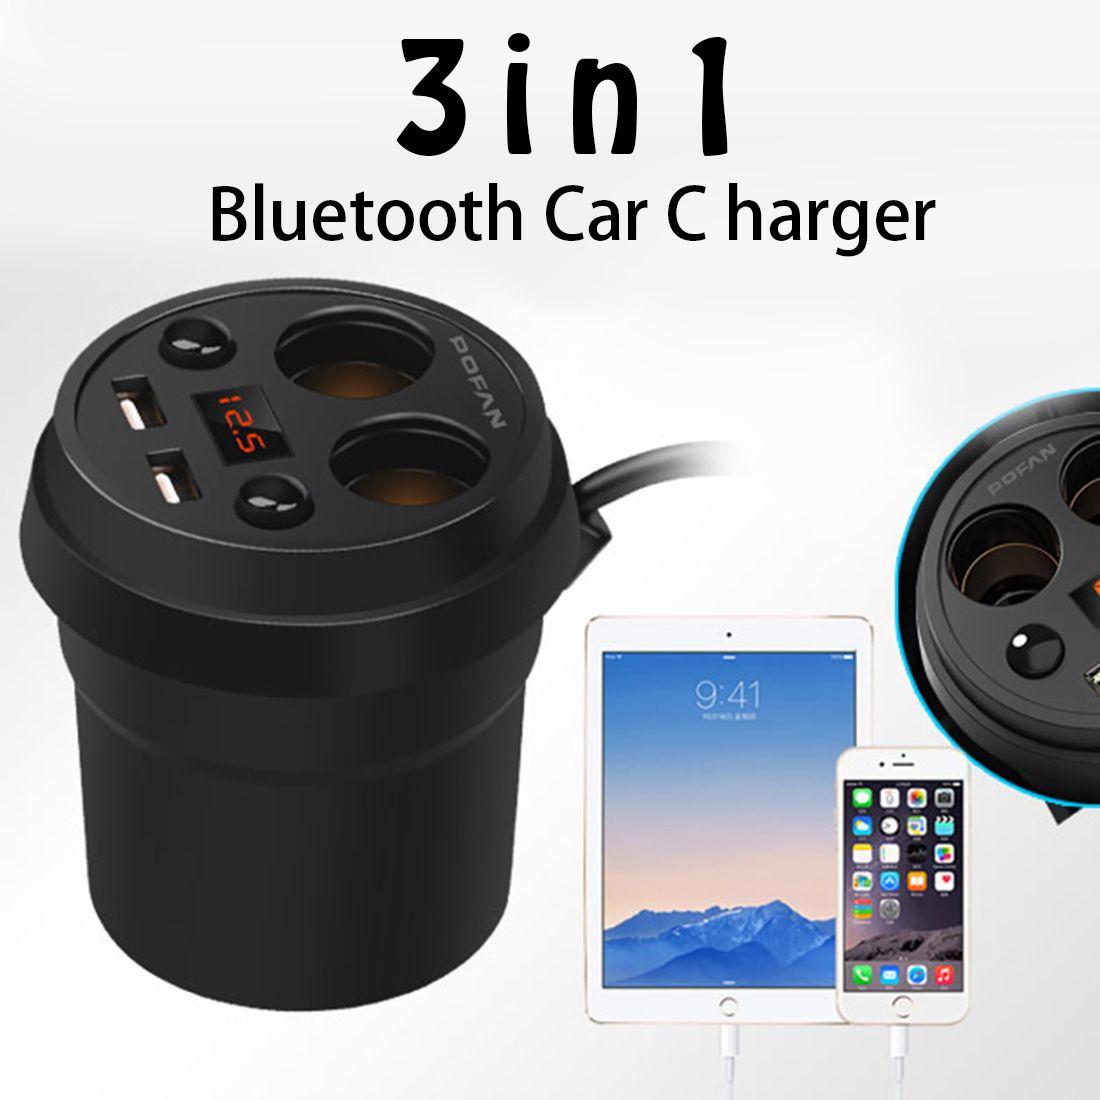 Etmakit Cup Car Charger Multi-function Display Voltage 3.1A 2 USB Carcharger DC12-24V Cigarette Lighter Splitter For Mobile GPS